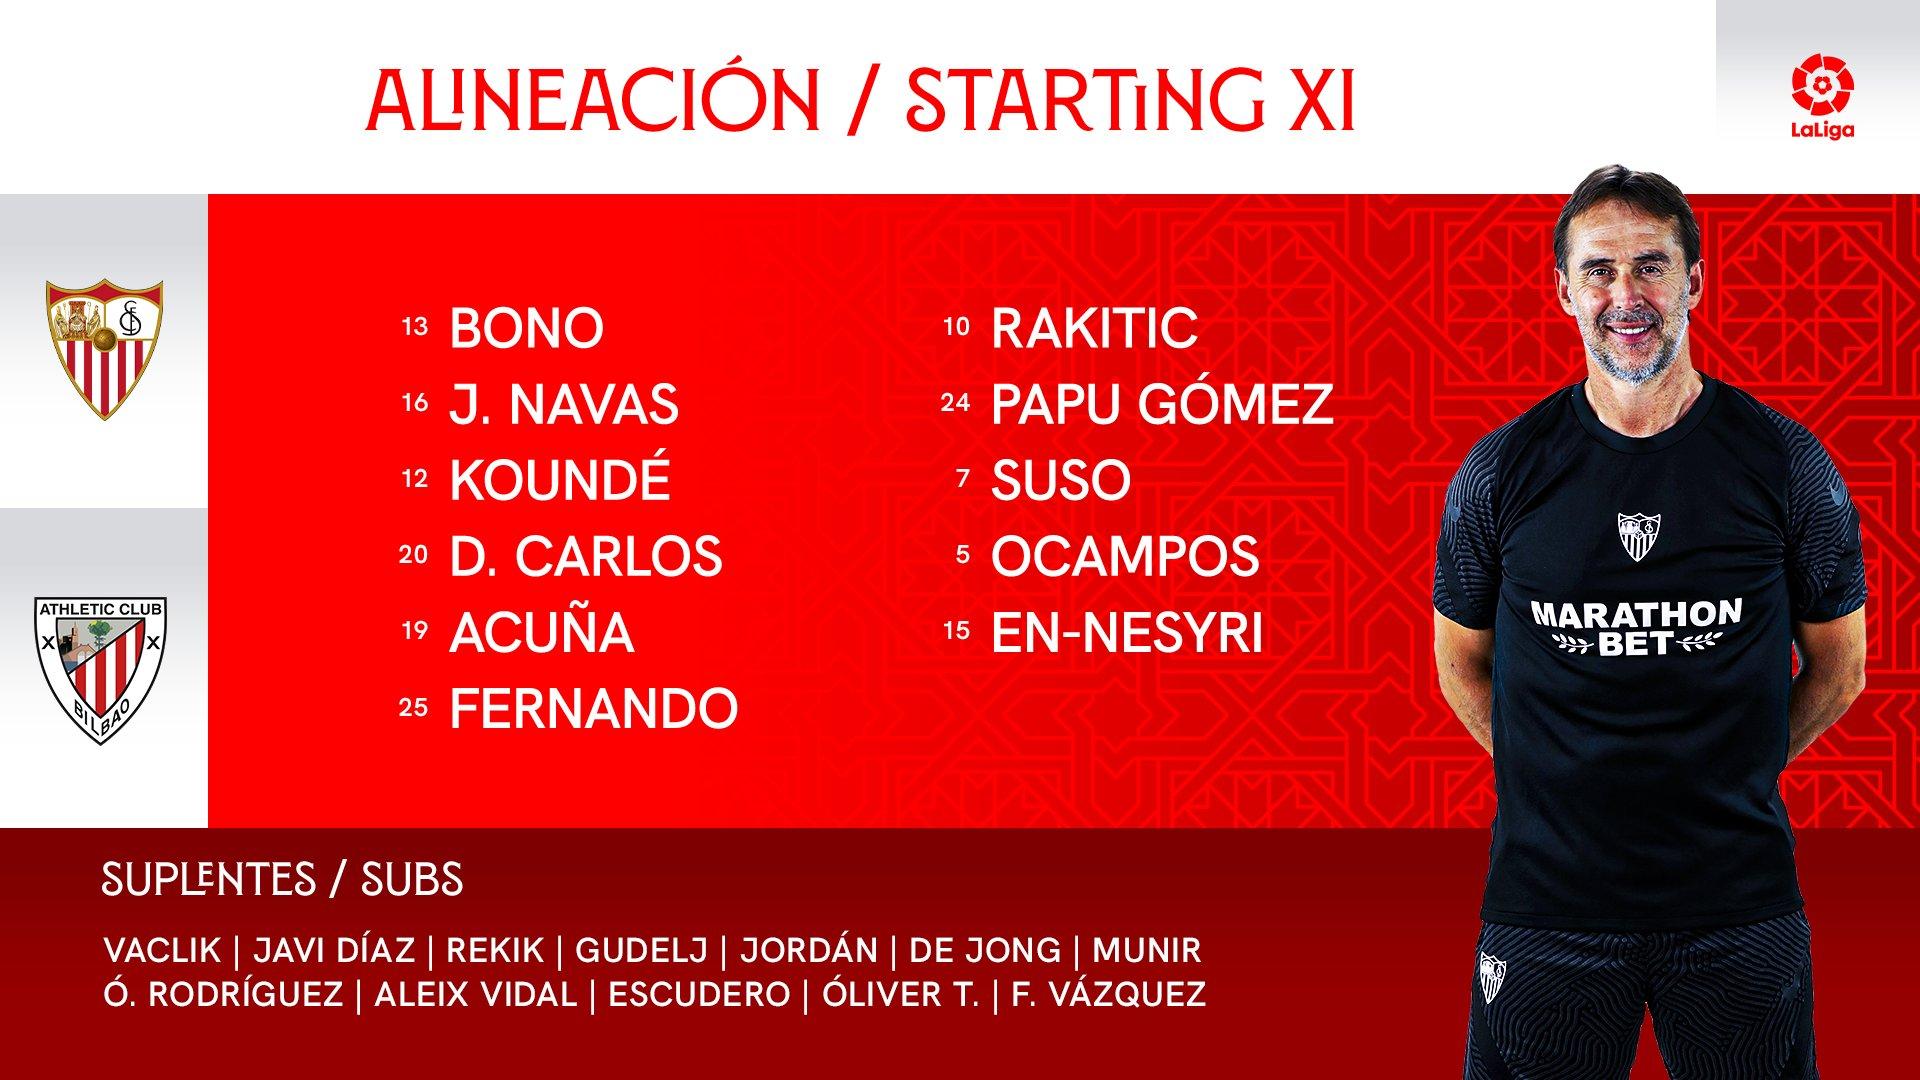 E0exMslWQAIav_k?format=jpg&name=large Alineaciones oficiales del Sevilla-Athletic - Comunio-Biwenger